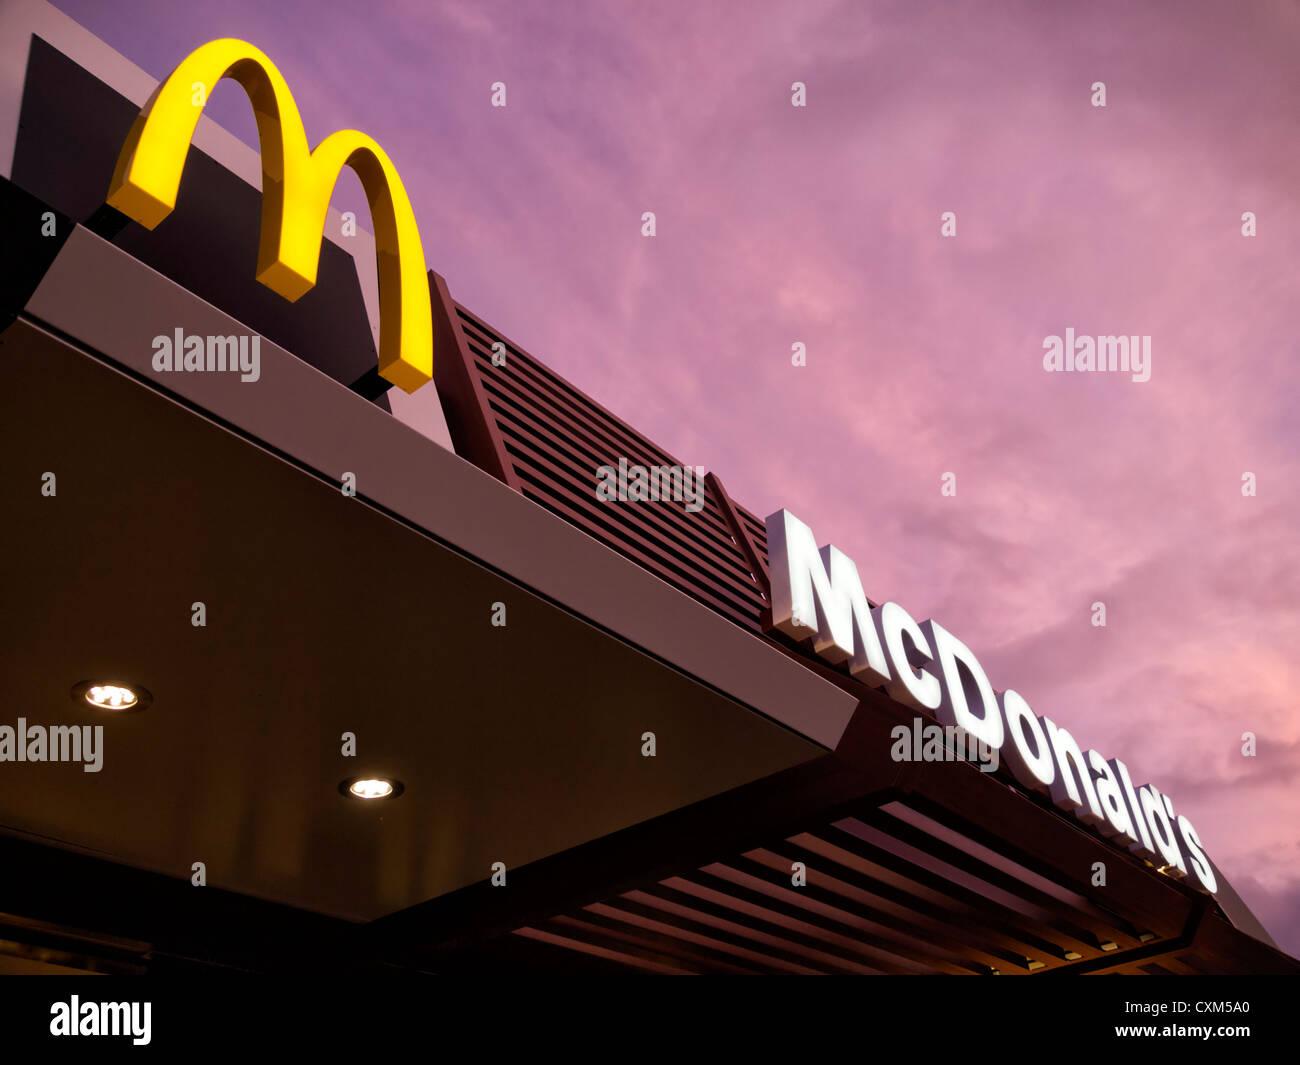 McDonald's restaurant sign - Stock Image